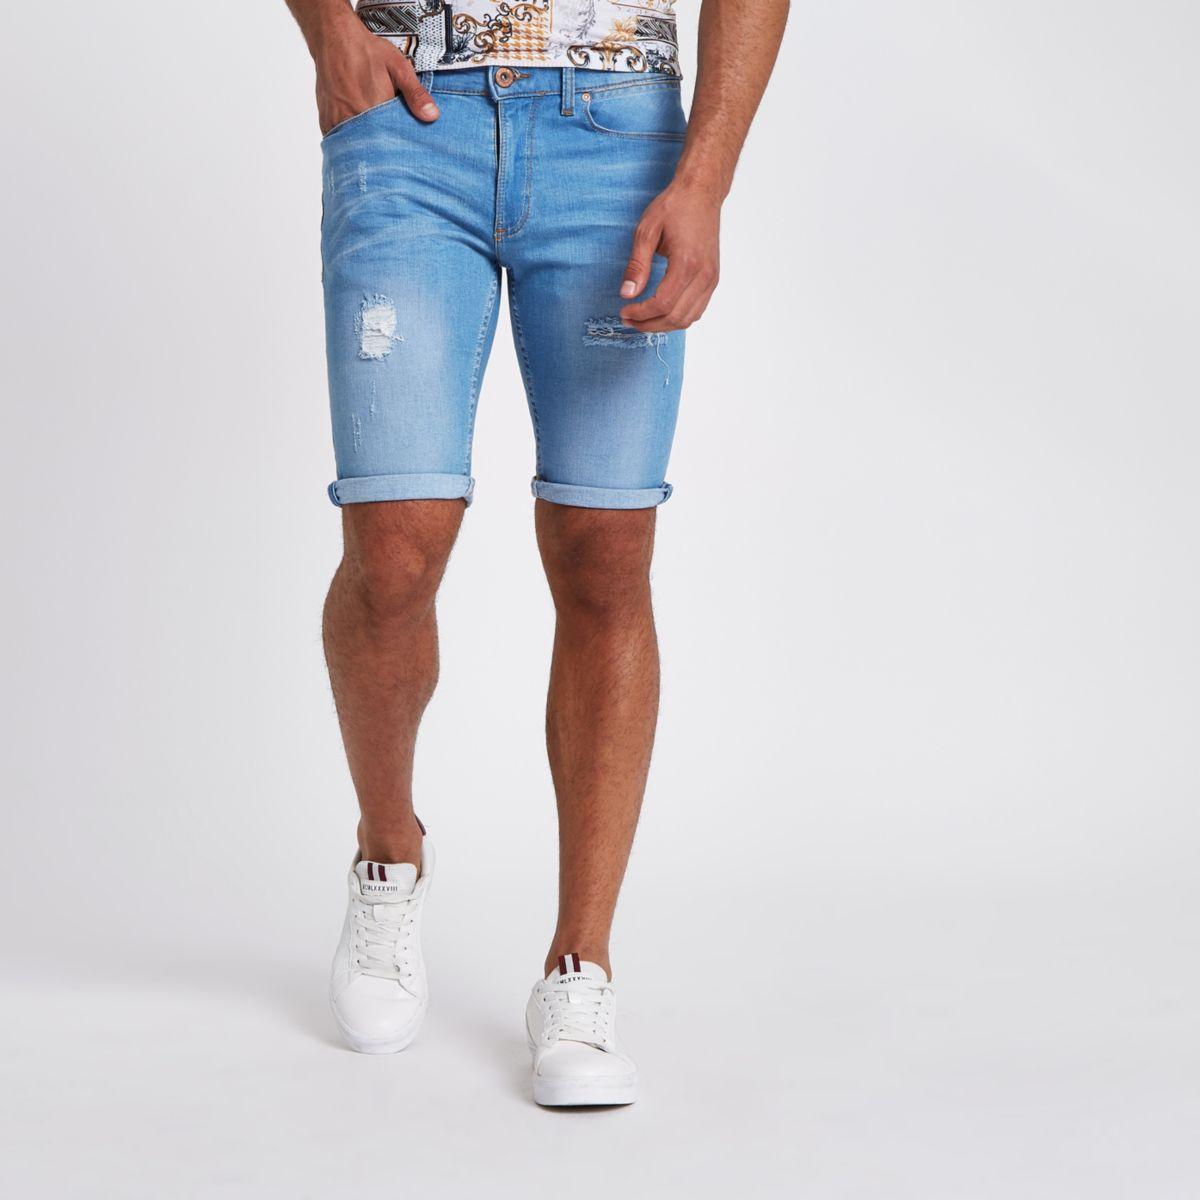 Light blue wash skinny ripped denim shorts